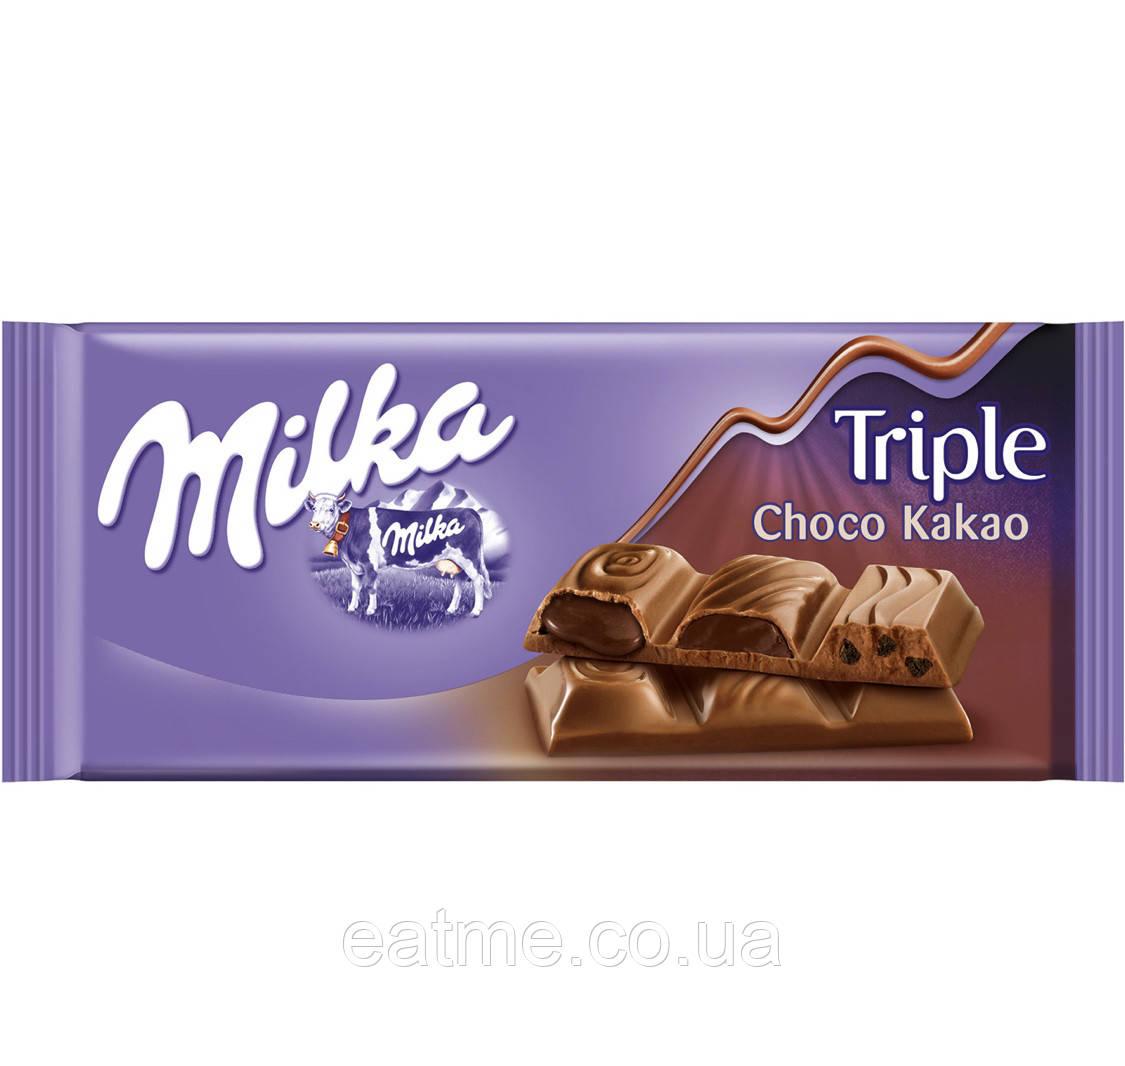 Milka Triple Choco Kakao Молочный шоколад с тремя видами начинки: жидкий шоколад, шоколадный мусс и кусочки